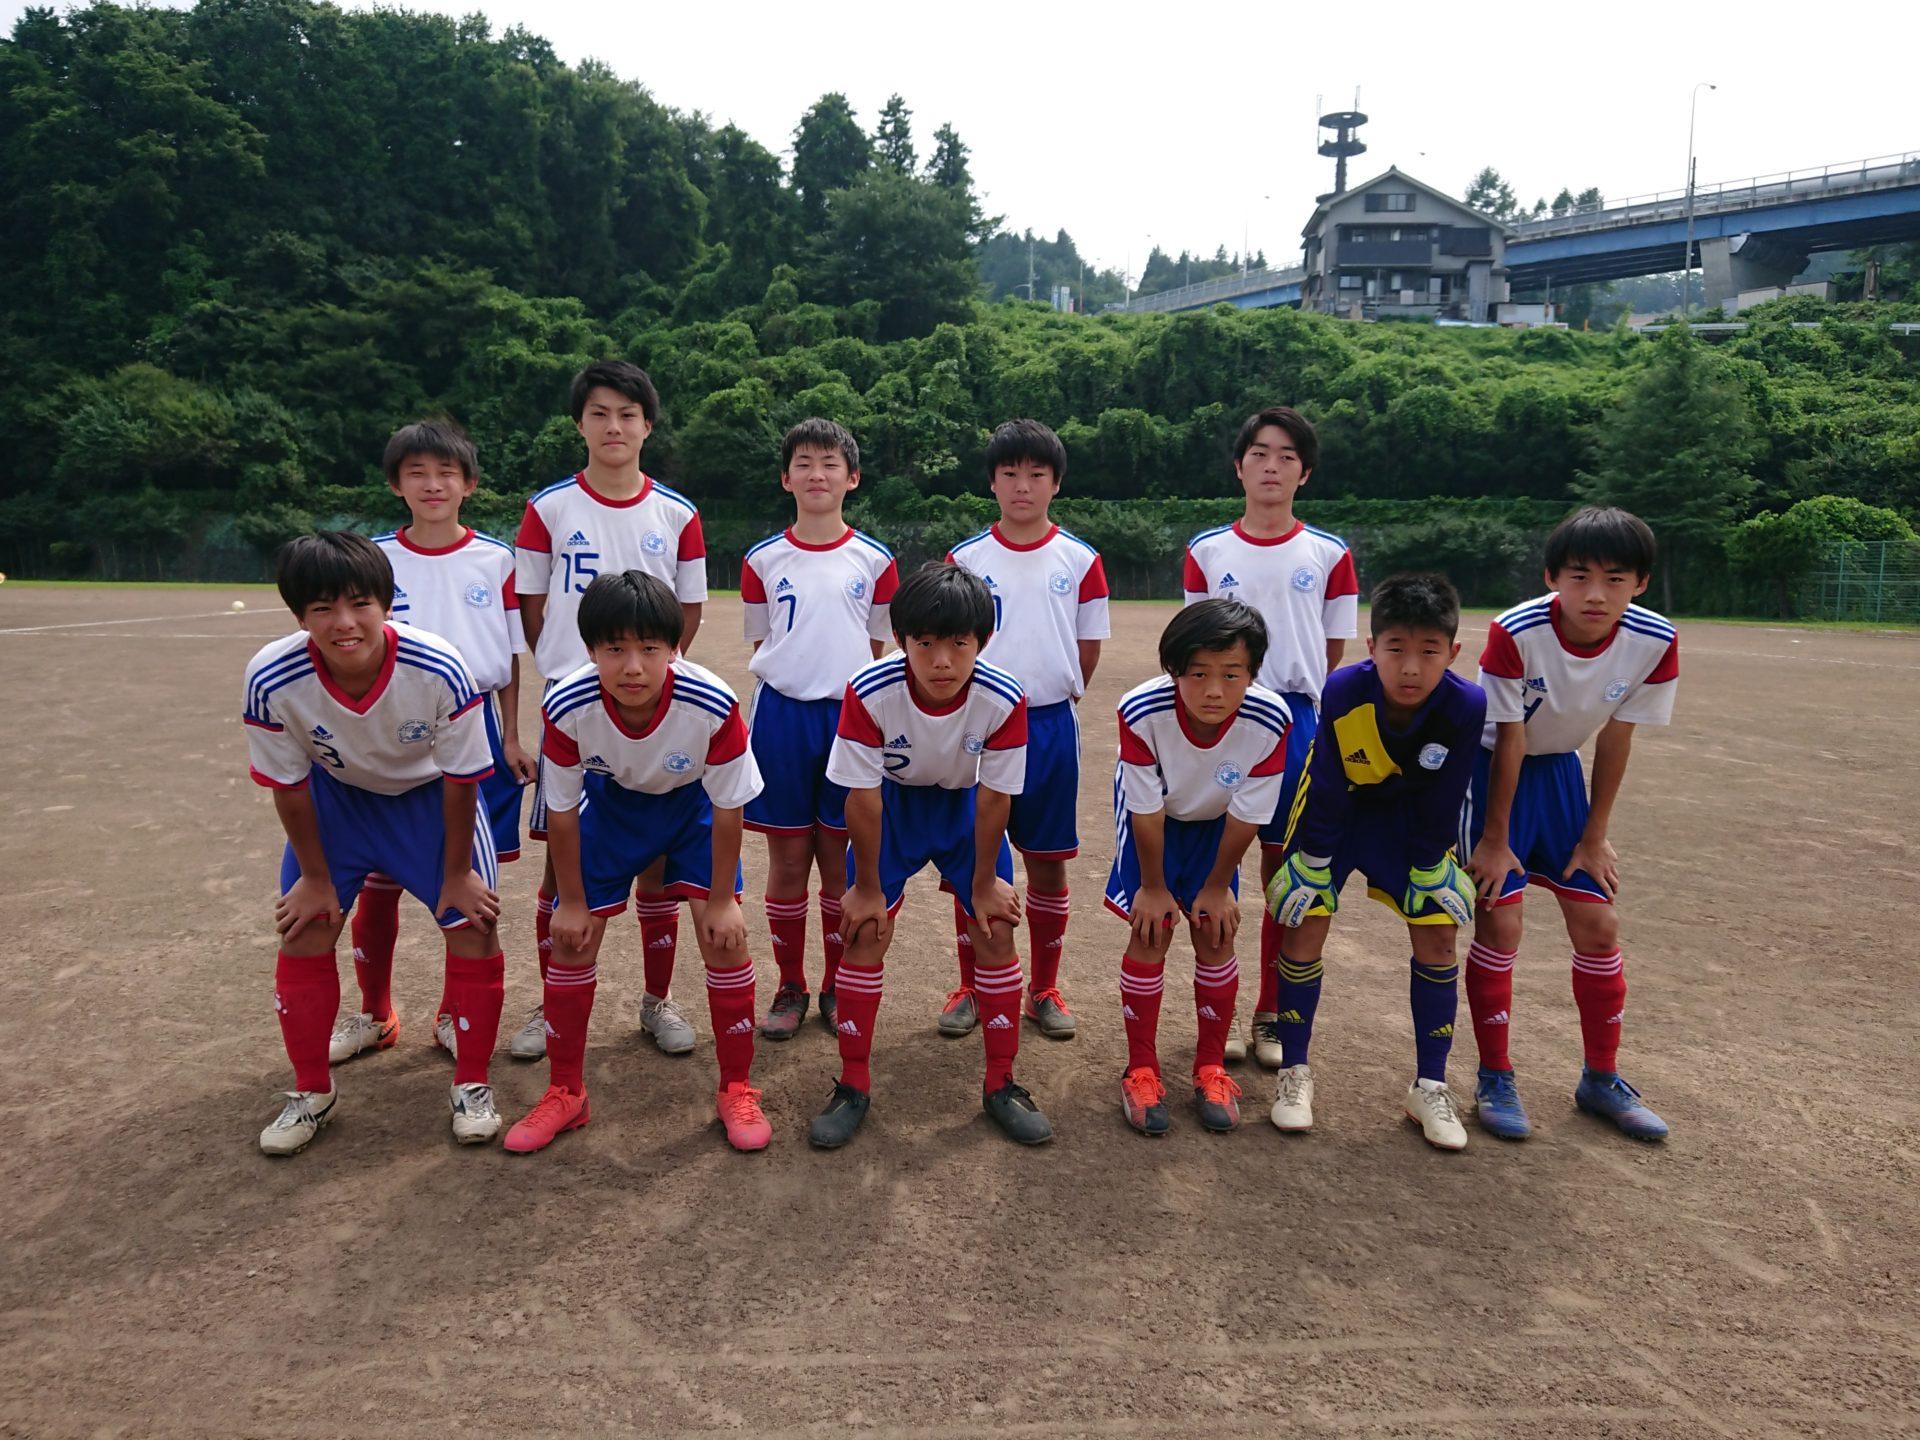 三多摩リーグU-14 vs Raffle瑞穂